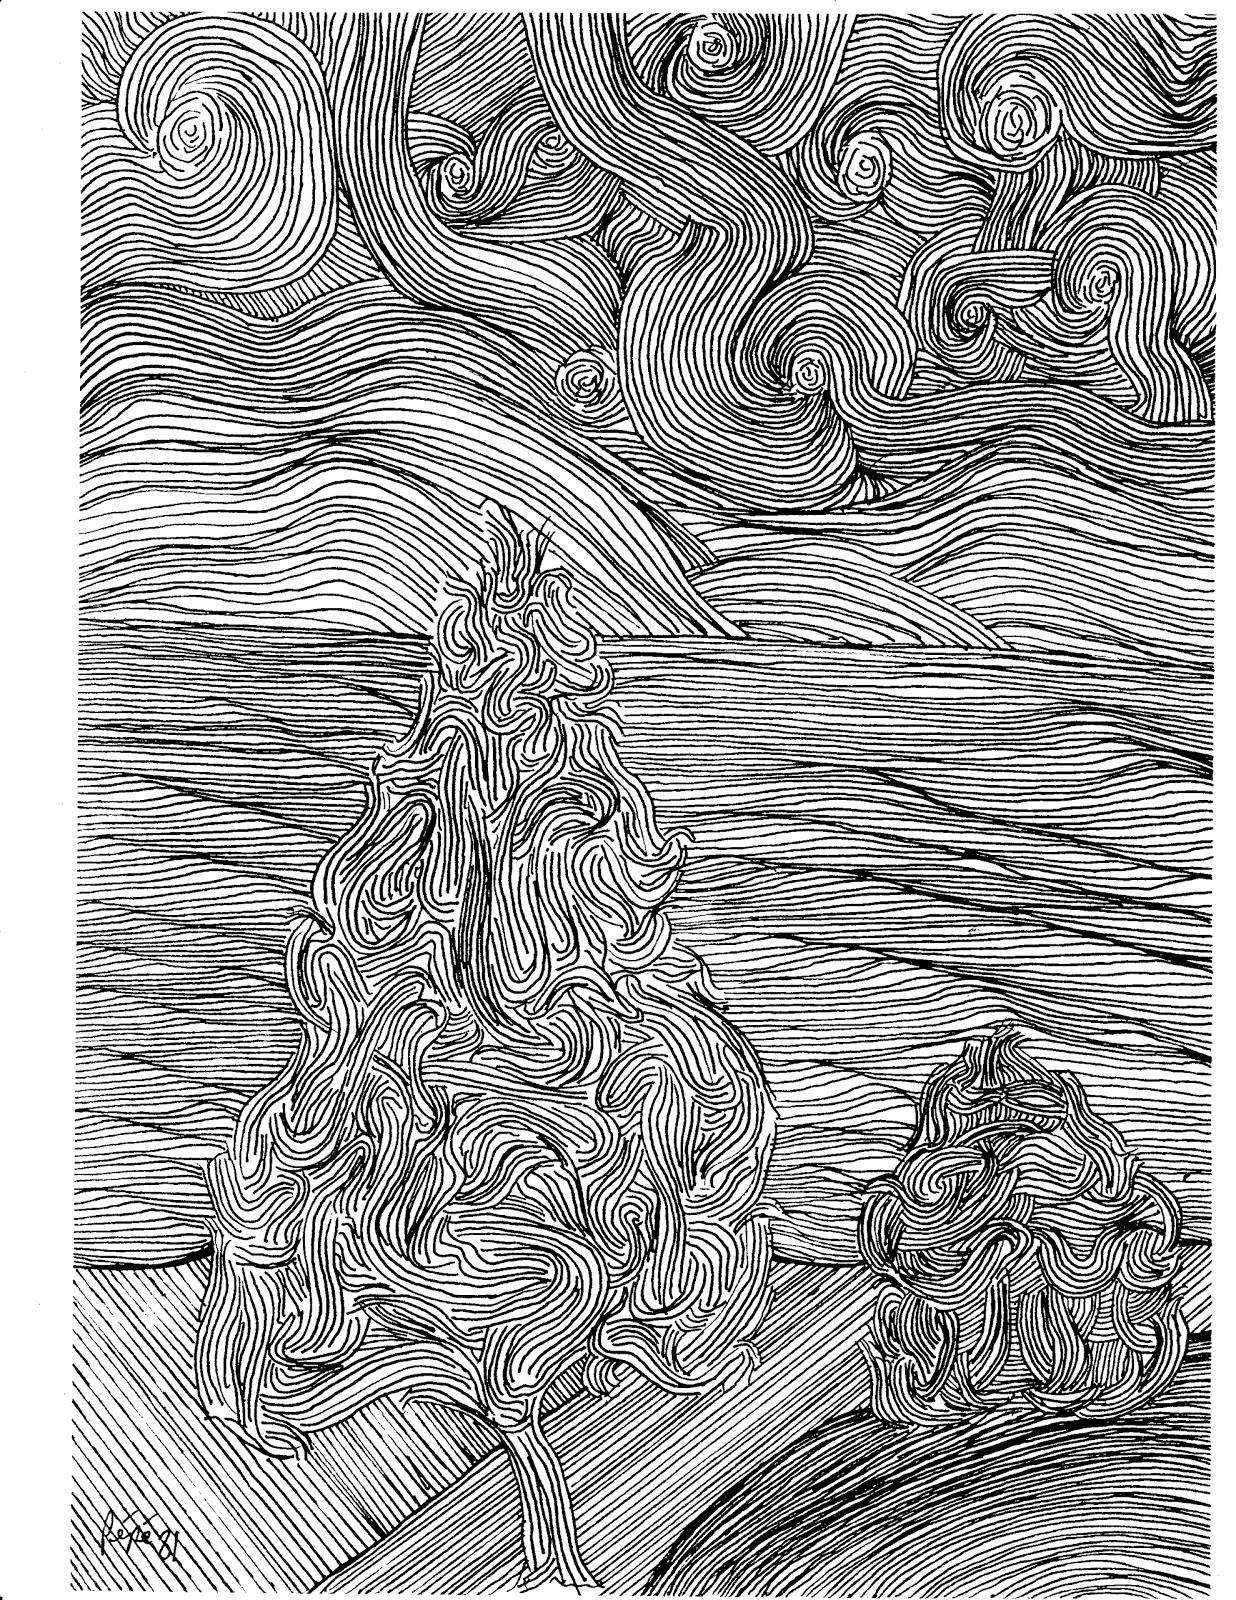 Line Art Ink : Peter g pereira